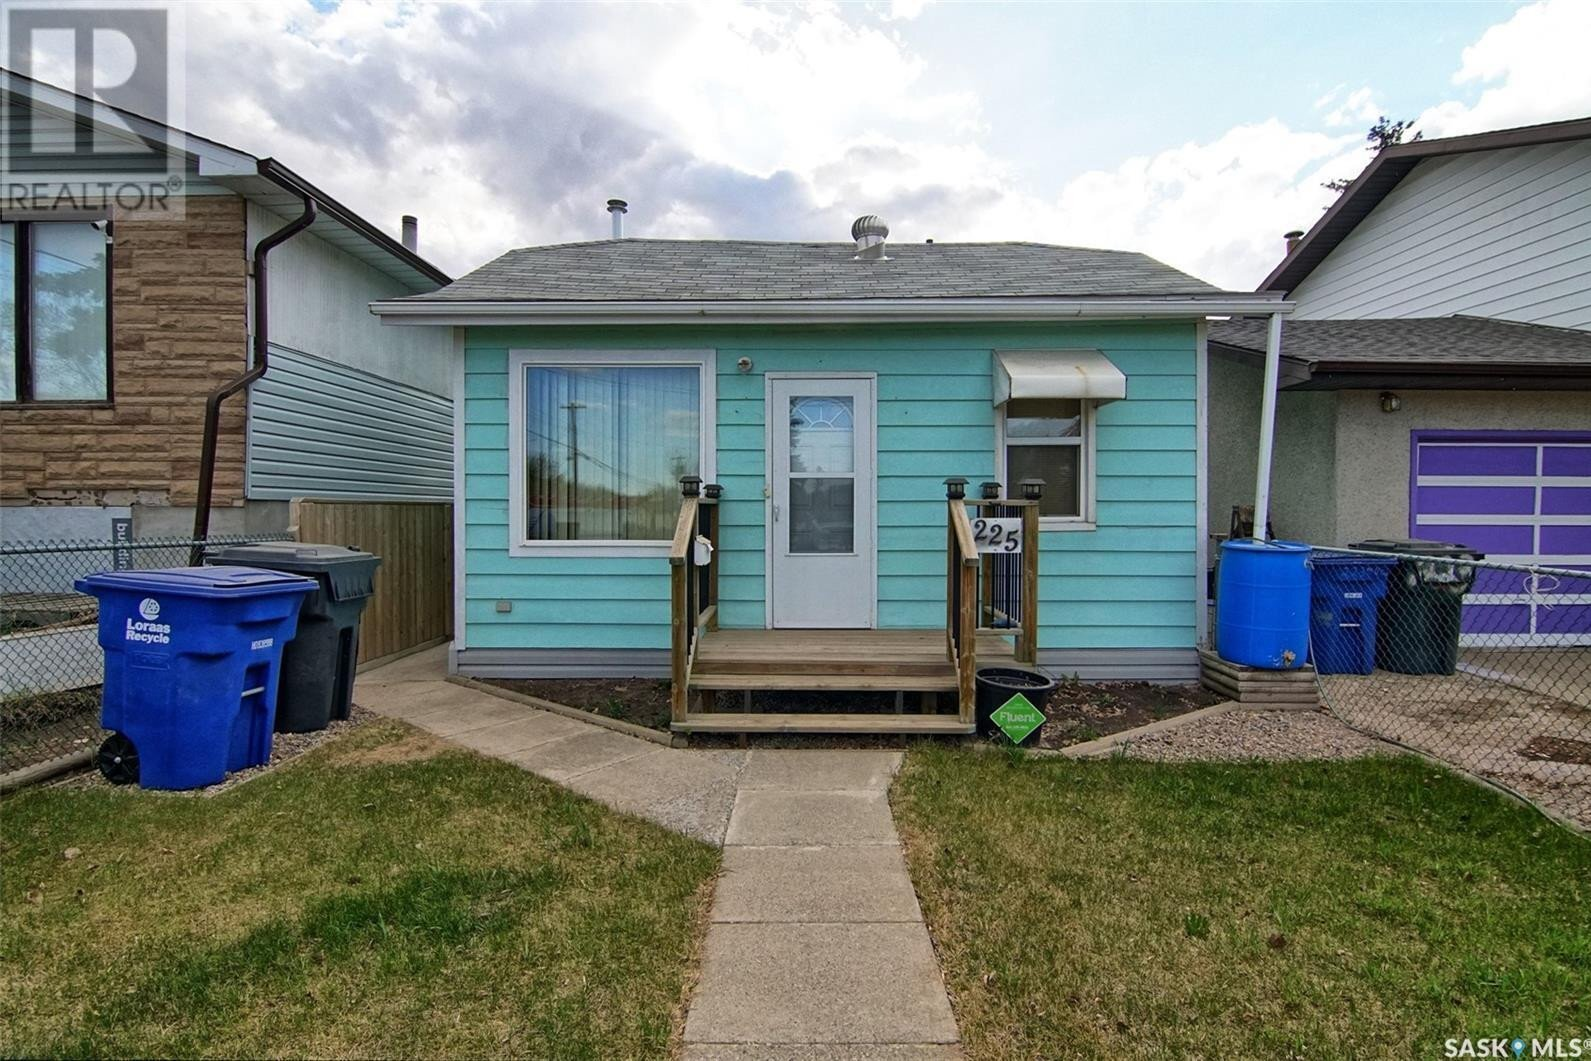 House for sale at 225 U Ave S Saskatoon Saskatchewan - MLS: SK831381